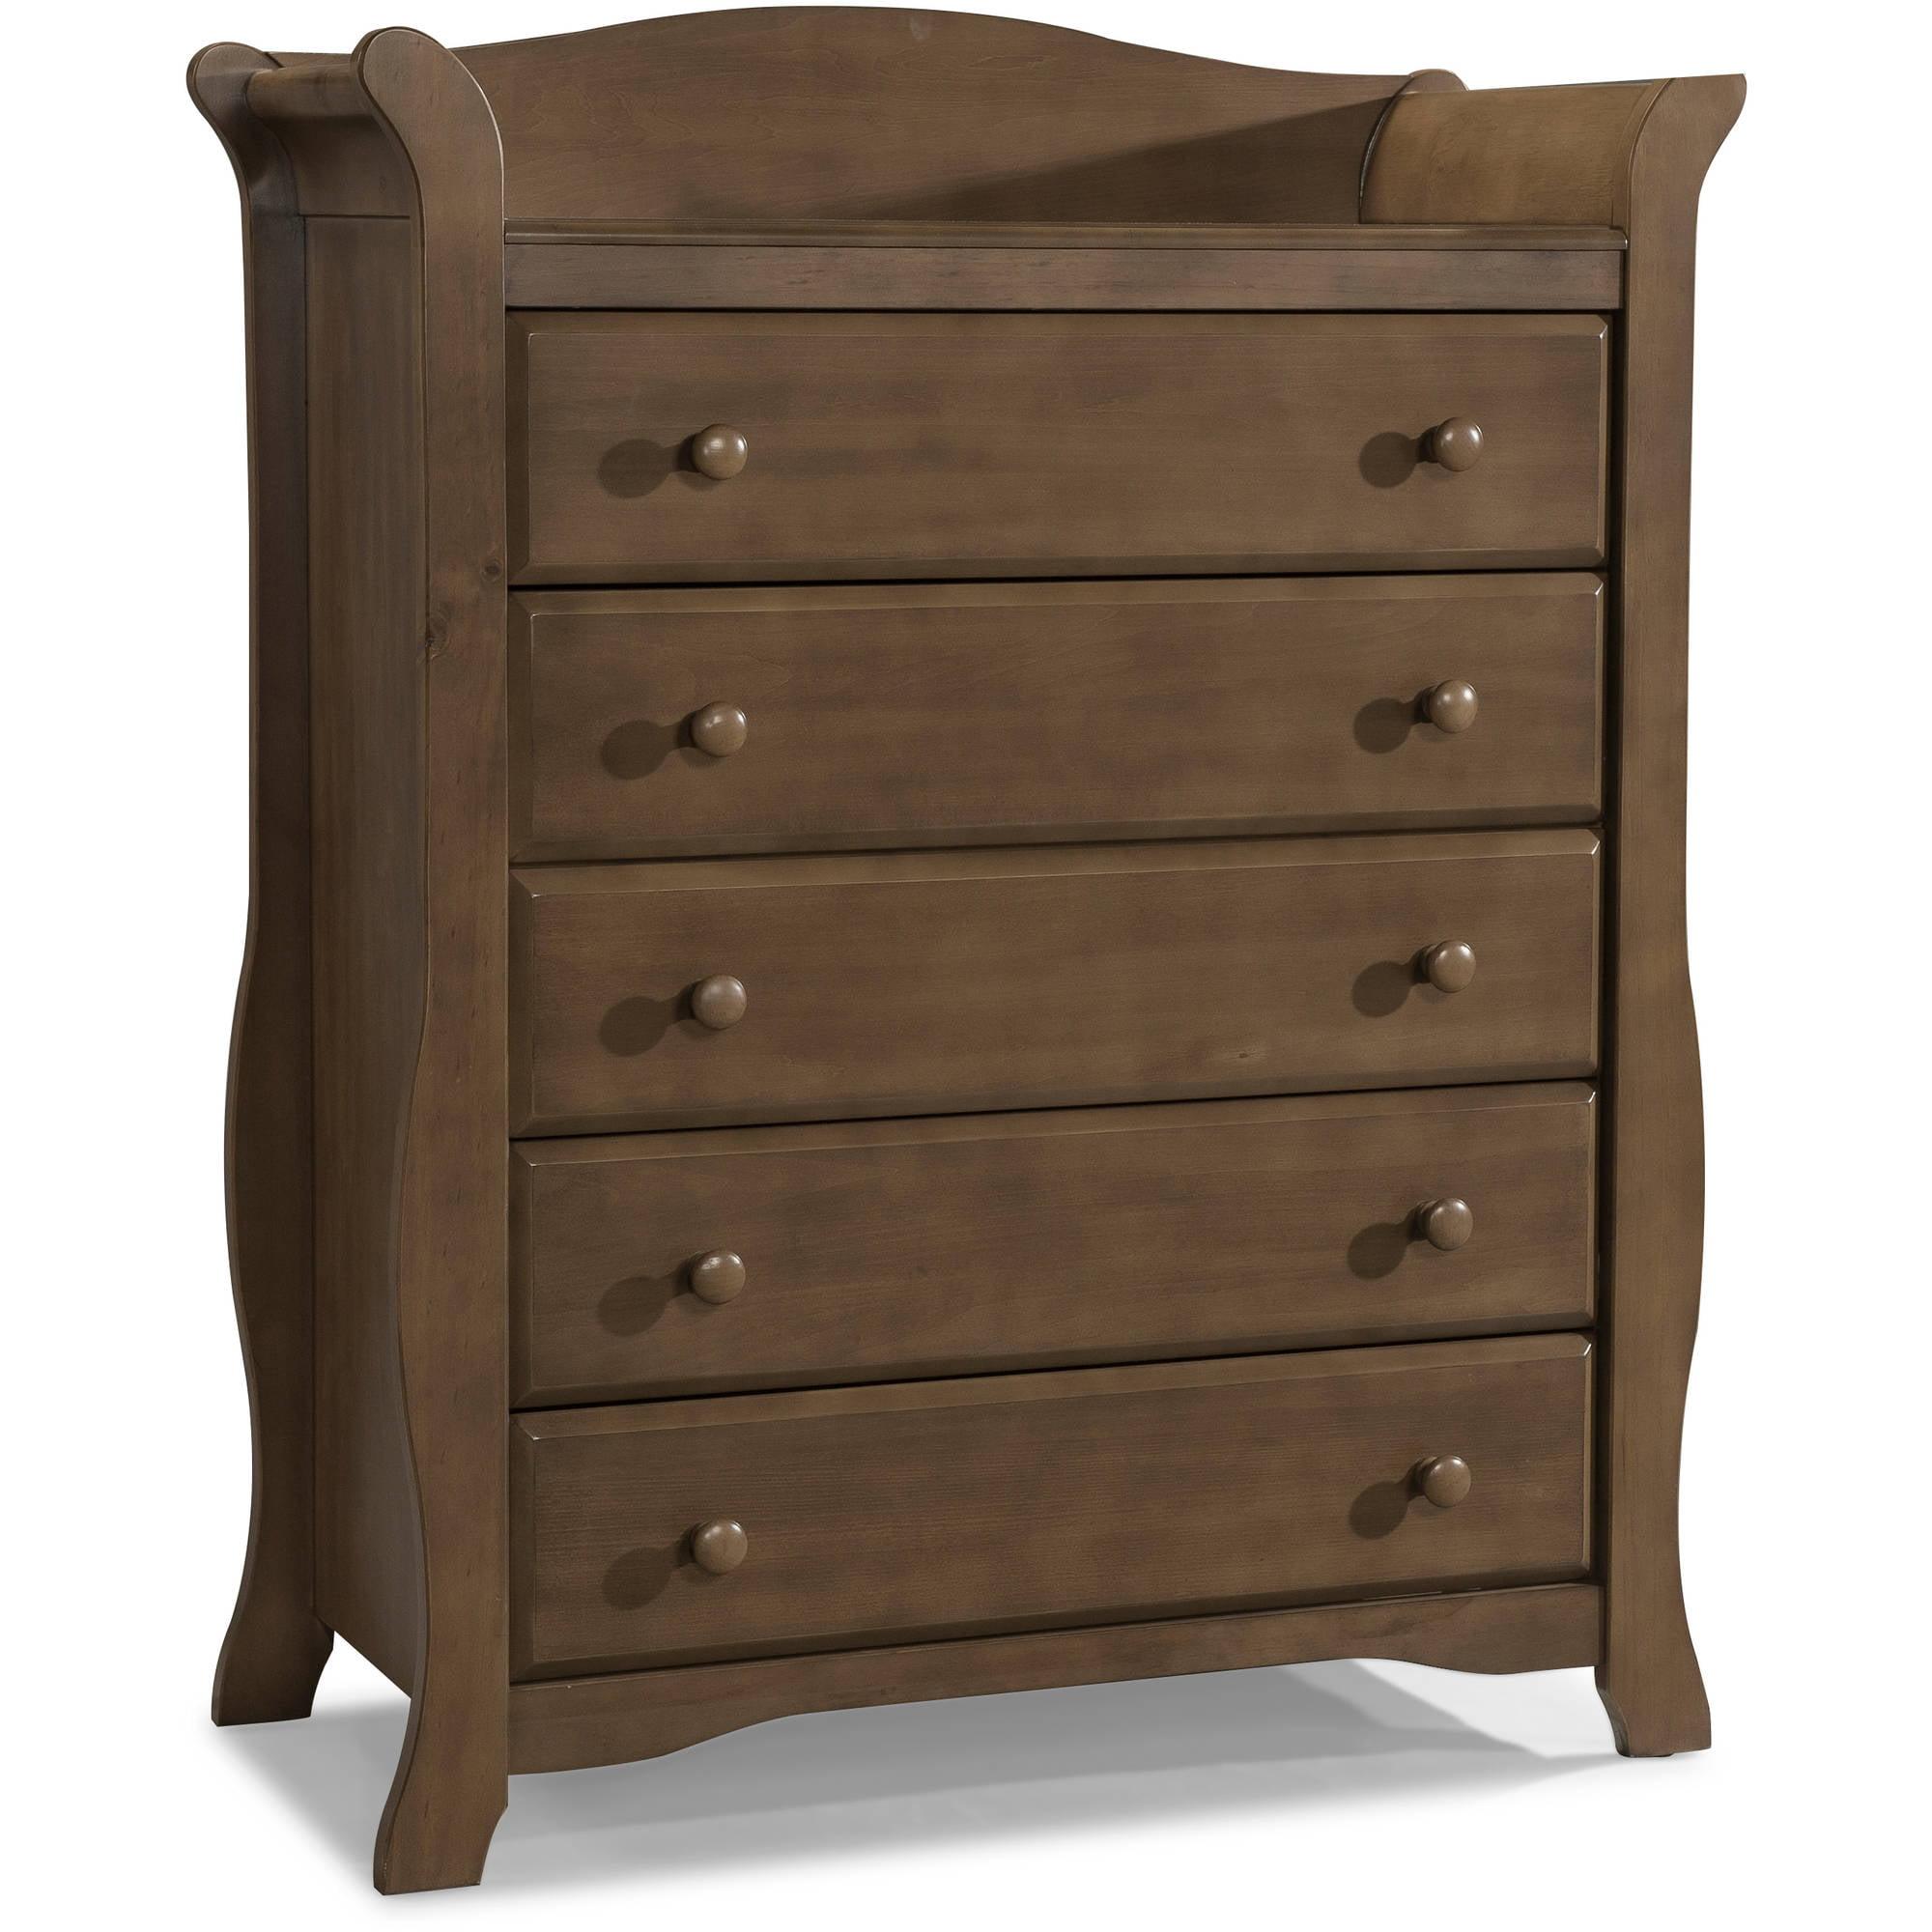 Storkcraft Avalon 5-Drawer Universal Dresser (Choose Your Finish)